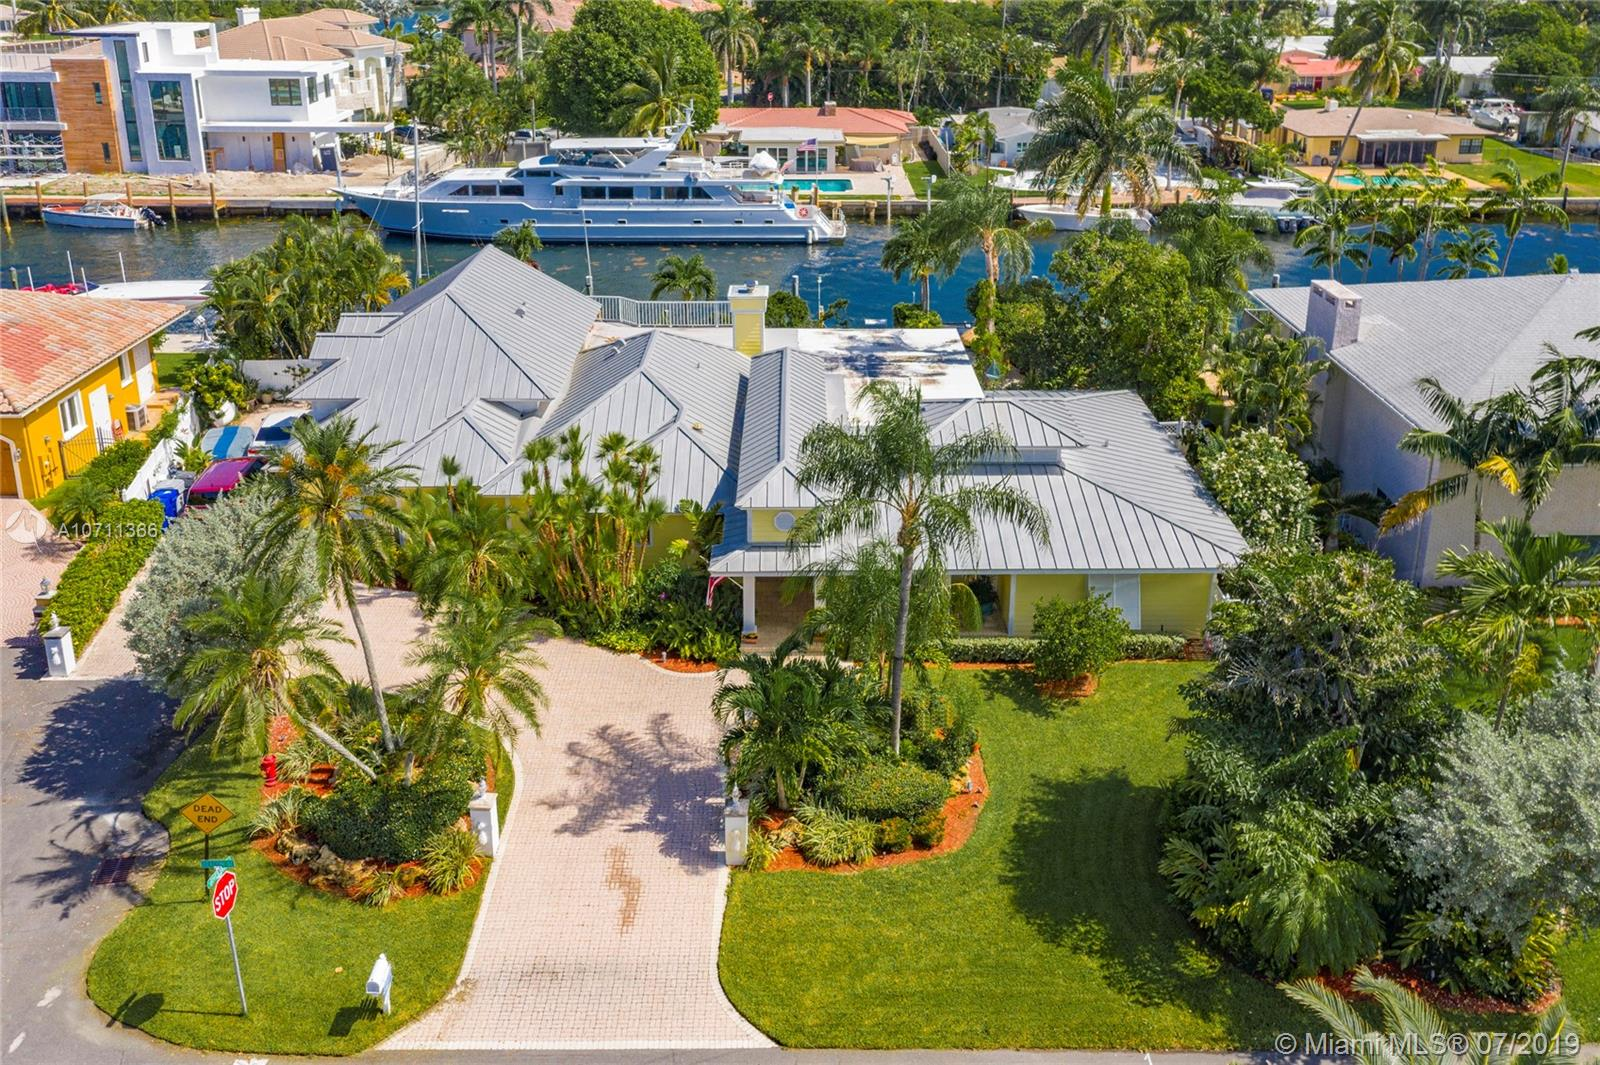 3201 Beacon St - Pompano Beach, Florida